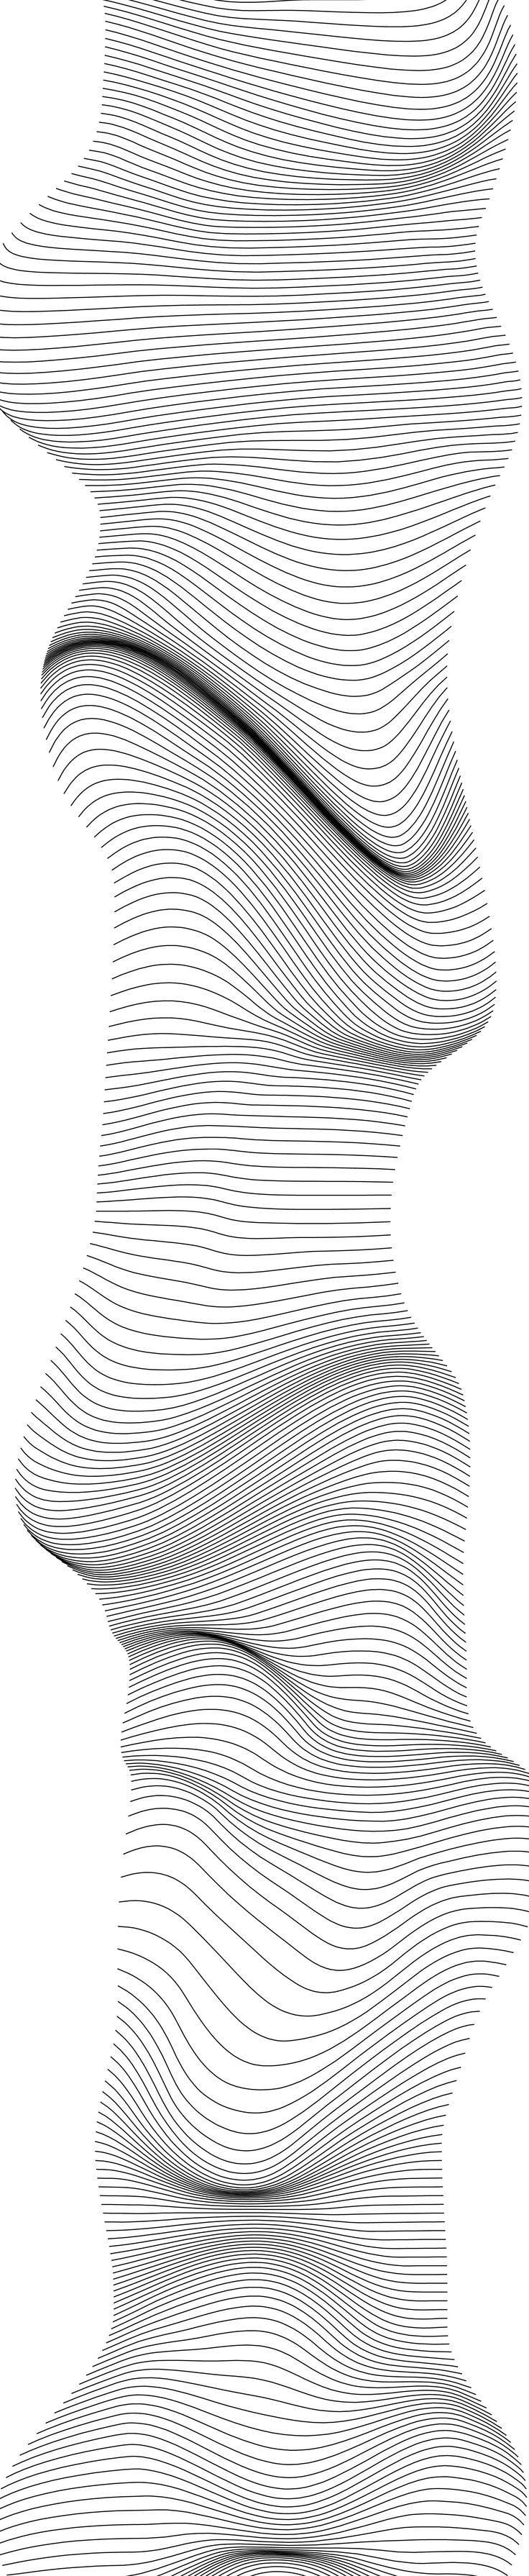 Parametric Pattern design by Yunus Emre Kara